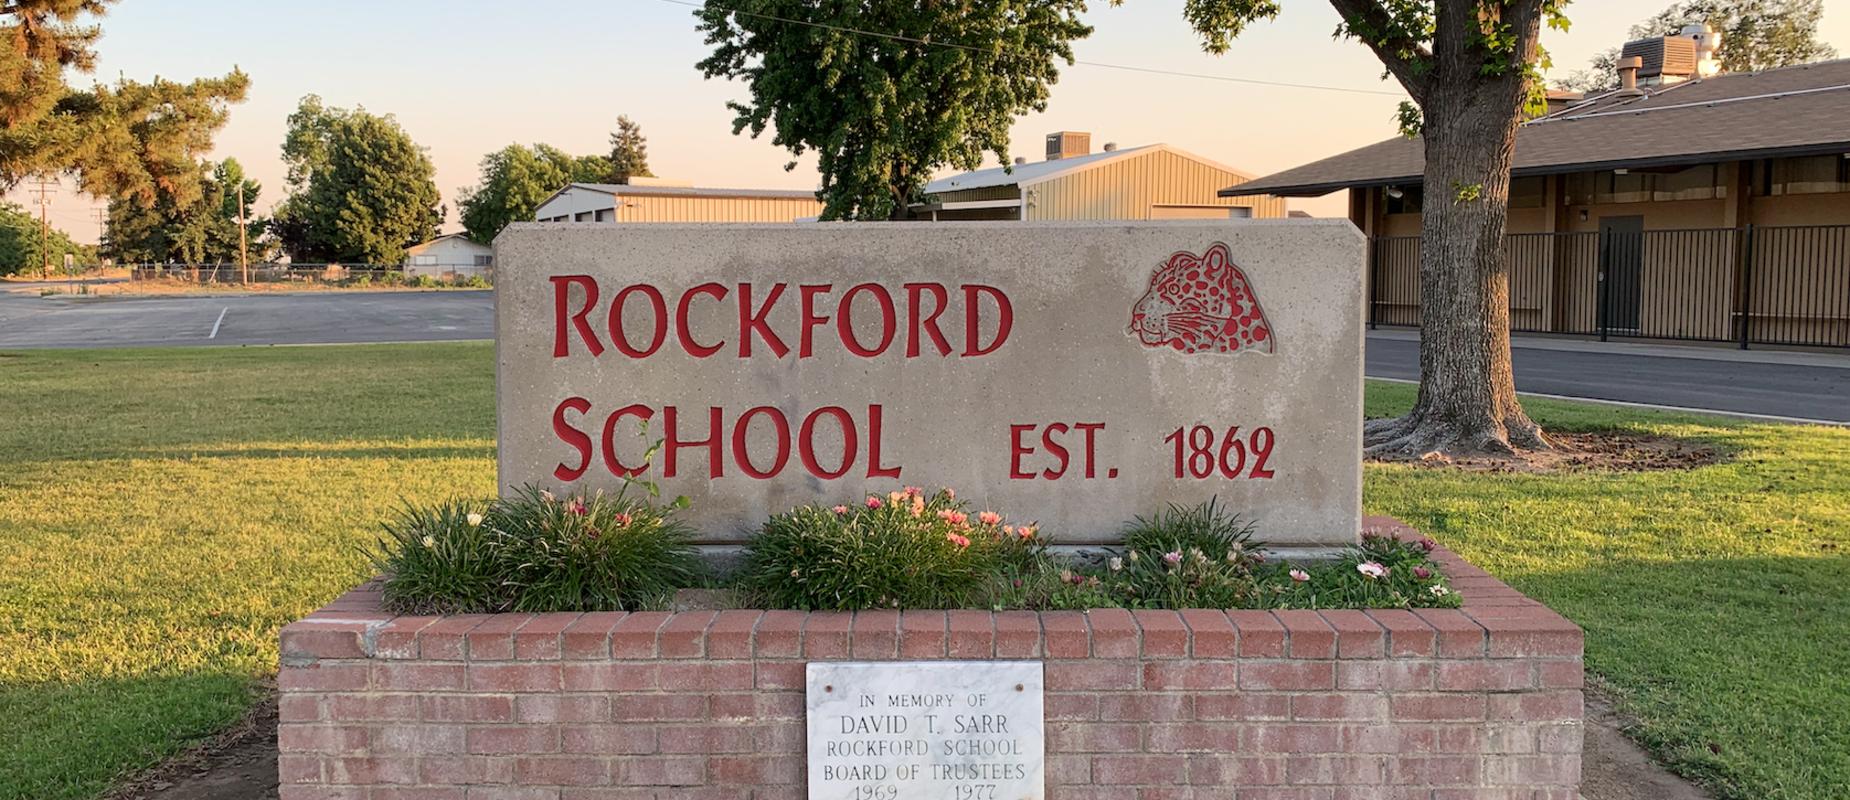 Rockford Elementary School District For Porterville School Calendar